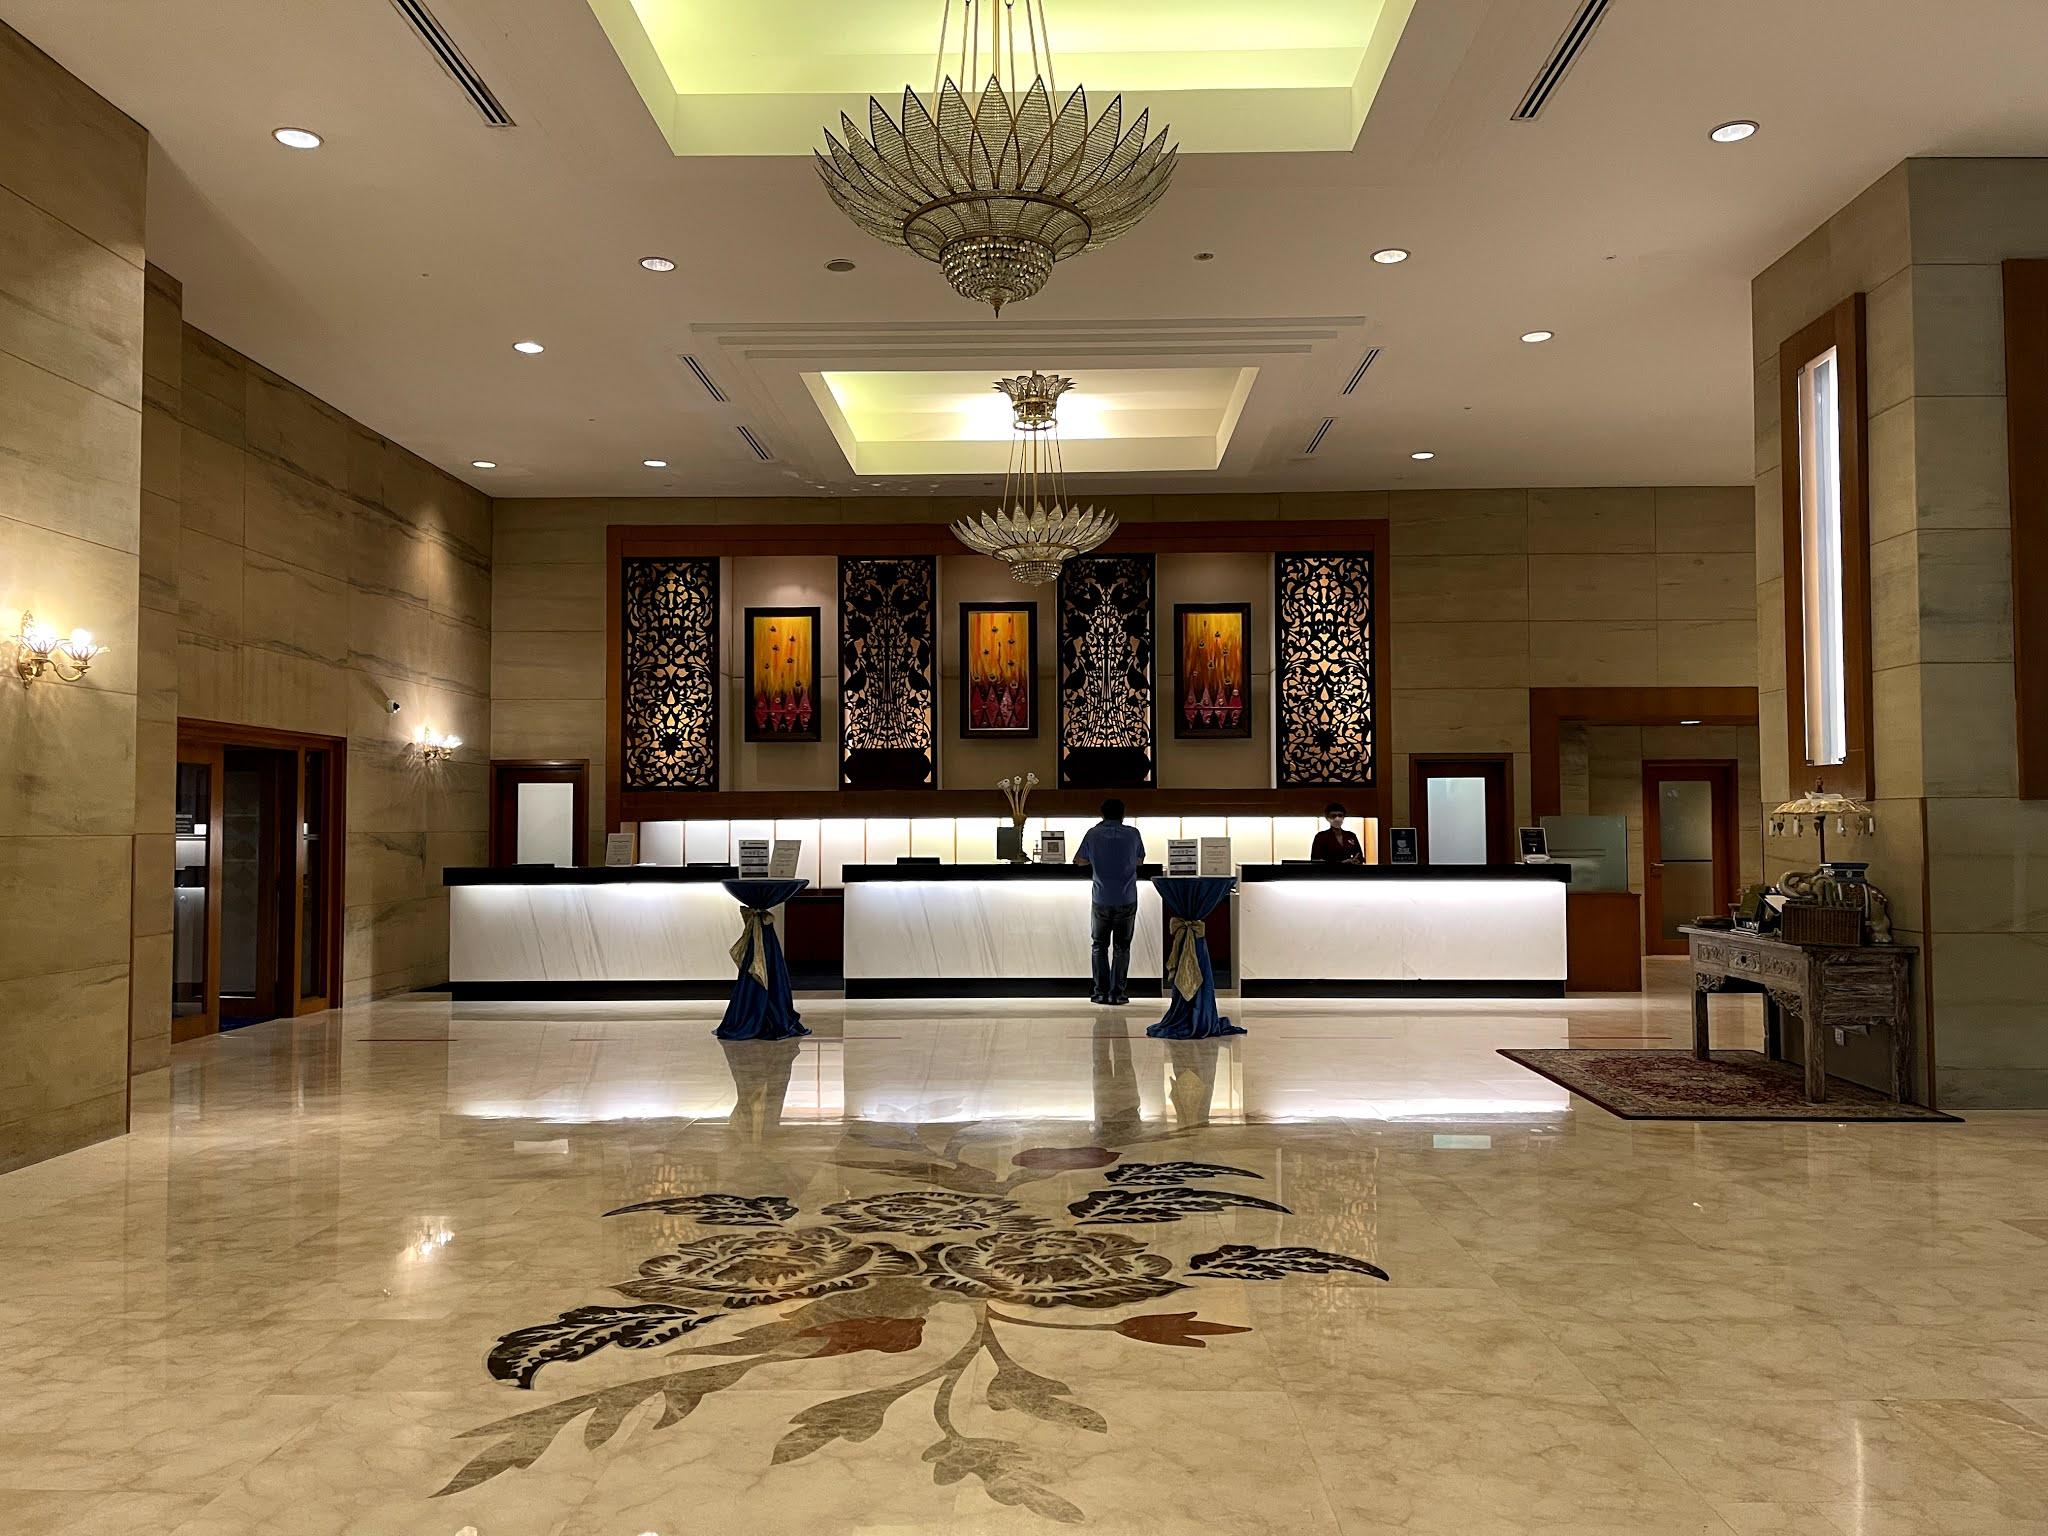 HOTEL REVIEW 2021 ROYALE CHULAN KUALA LUMPUR